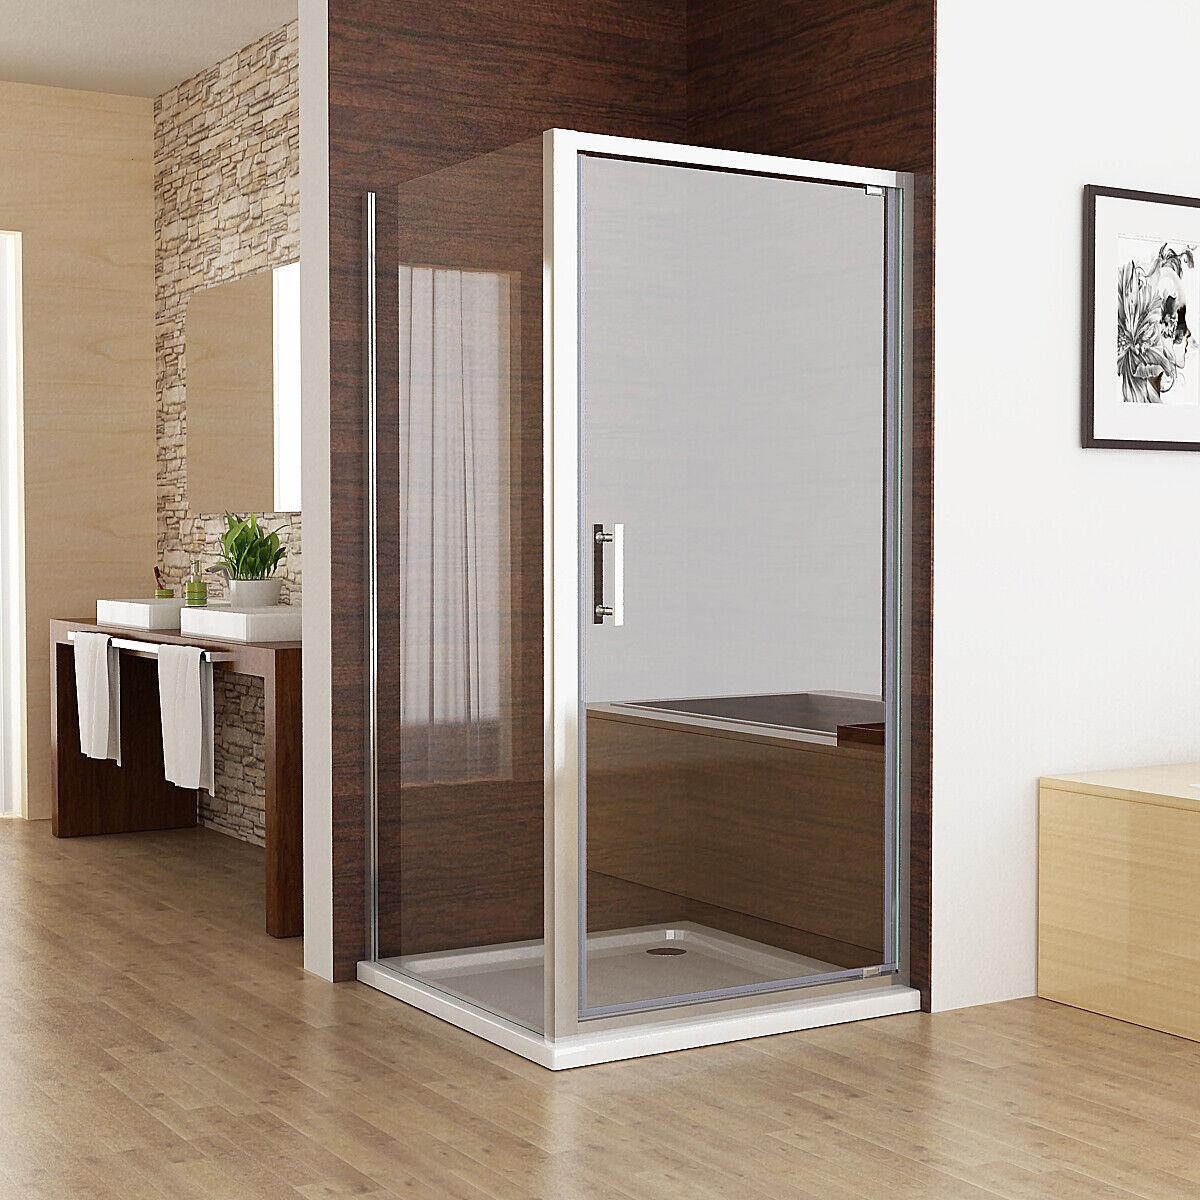 Shower Enclosure Pivot Hinged Door Nano Glass 800x800 900x900 760x760 760x900mm